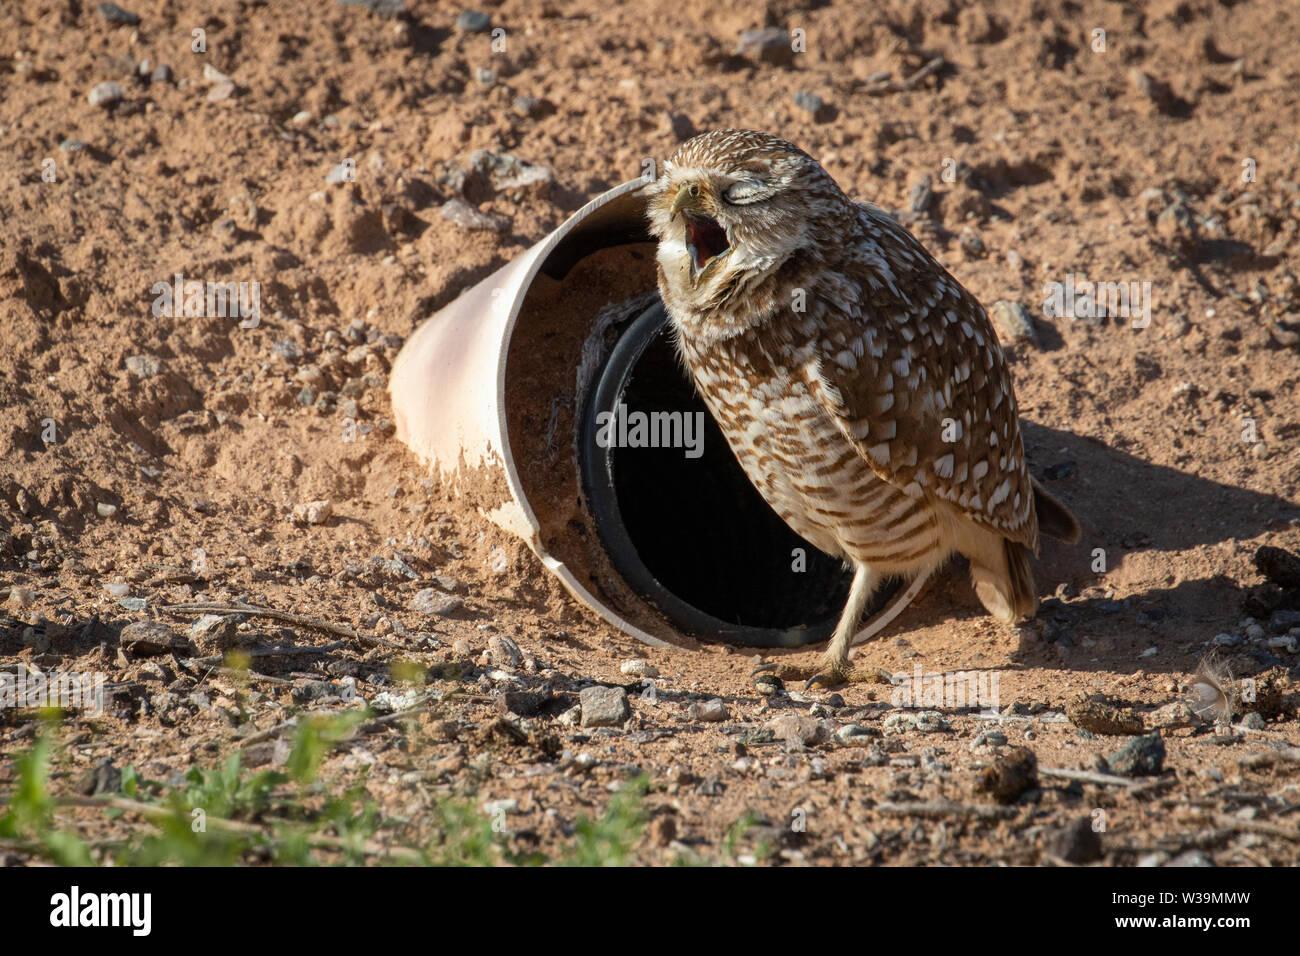 Burrowing owl yawning outside of its artificial nest burrow, Zarenjo Park, Arizona. - Stock Image